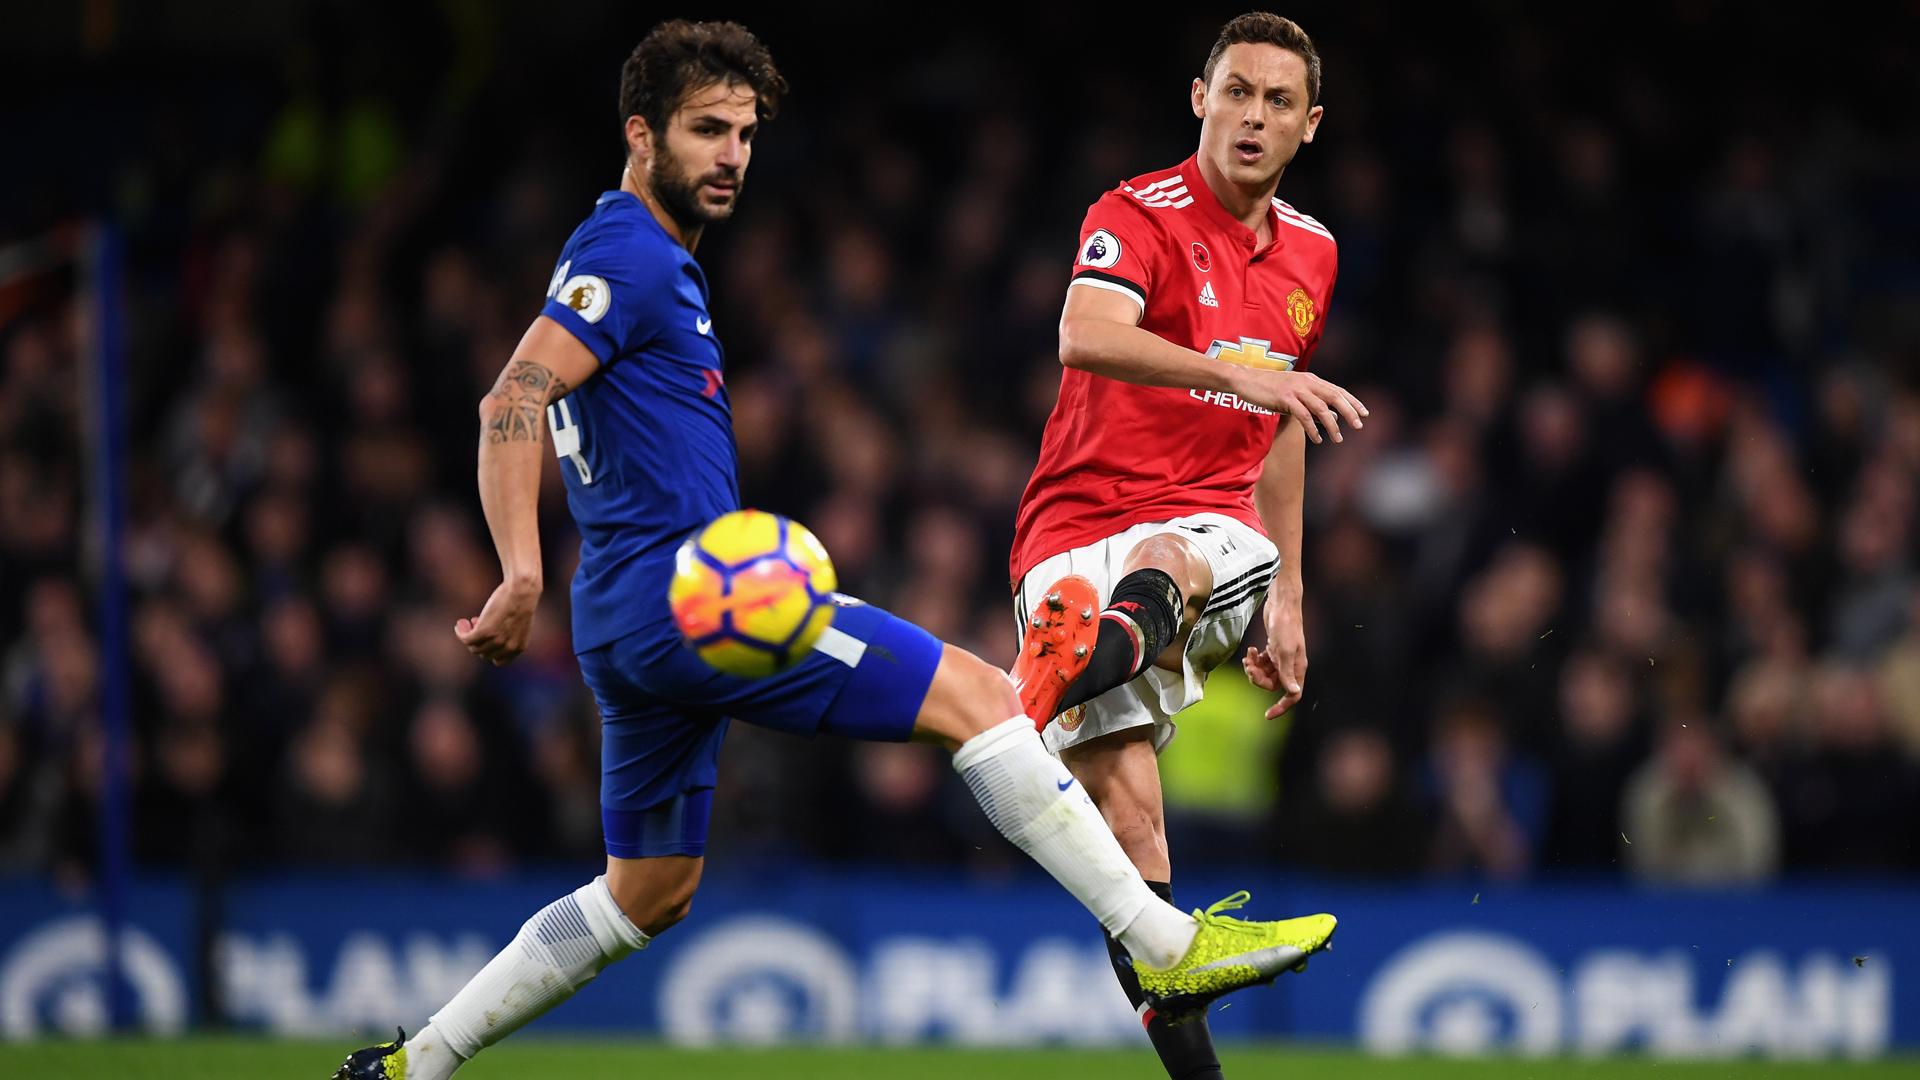 Chelsea Manchester United Fabregas Matic 05112017